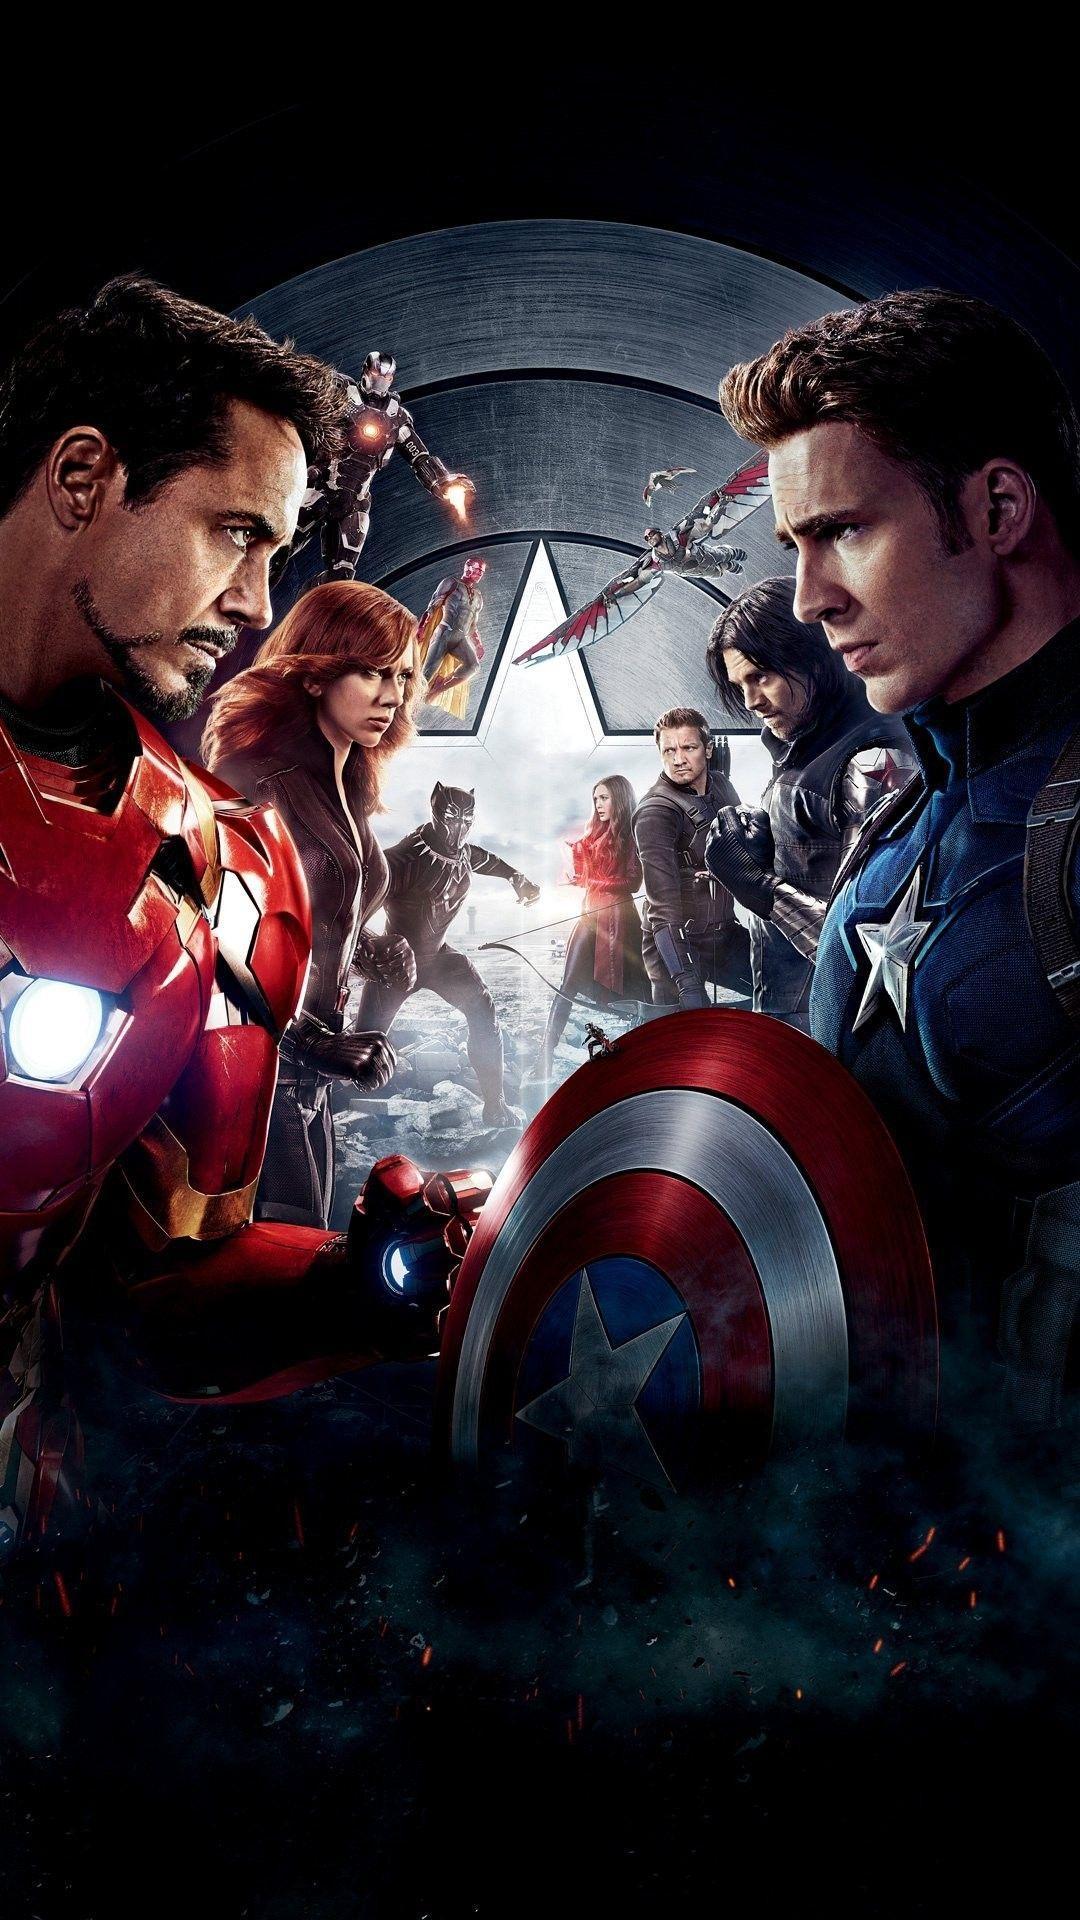 Iron Man Vs Captain America Wallpapers Wallpaper Cave